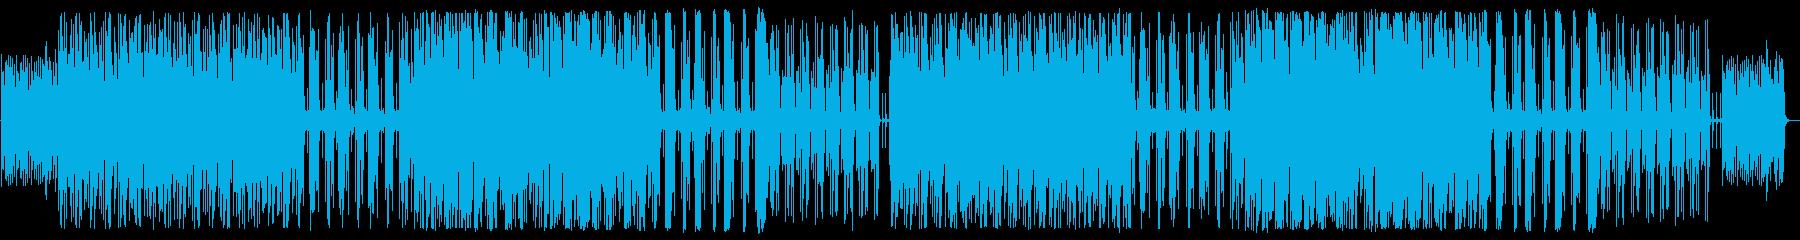 YouTube ピアノ・リズミカルの再生済みの波形